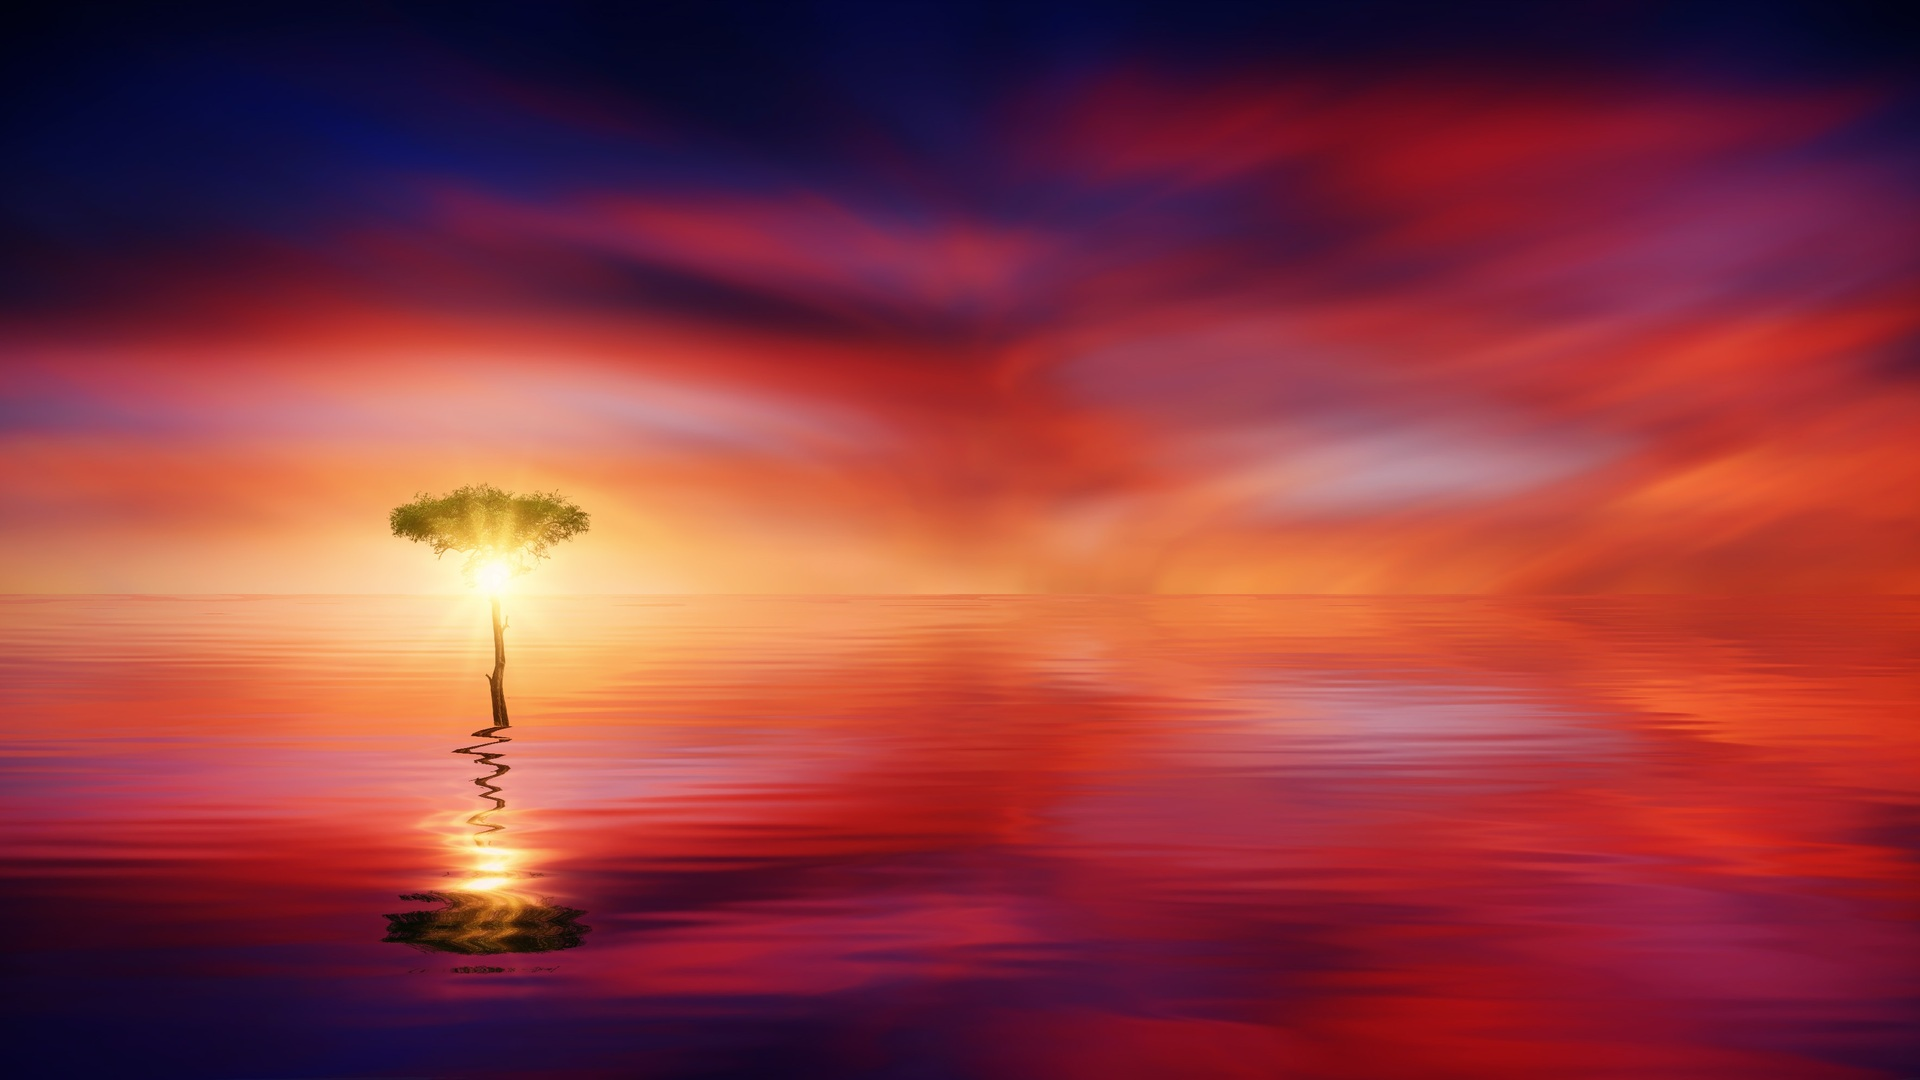 sunset-ocean-tree-sun-light-b7.jpg